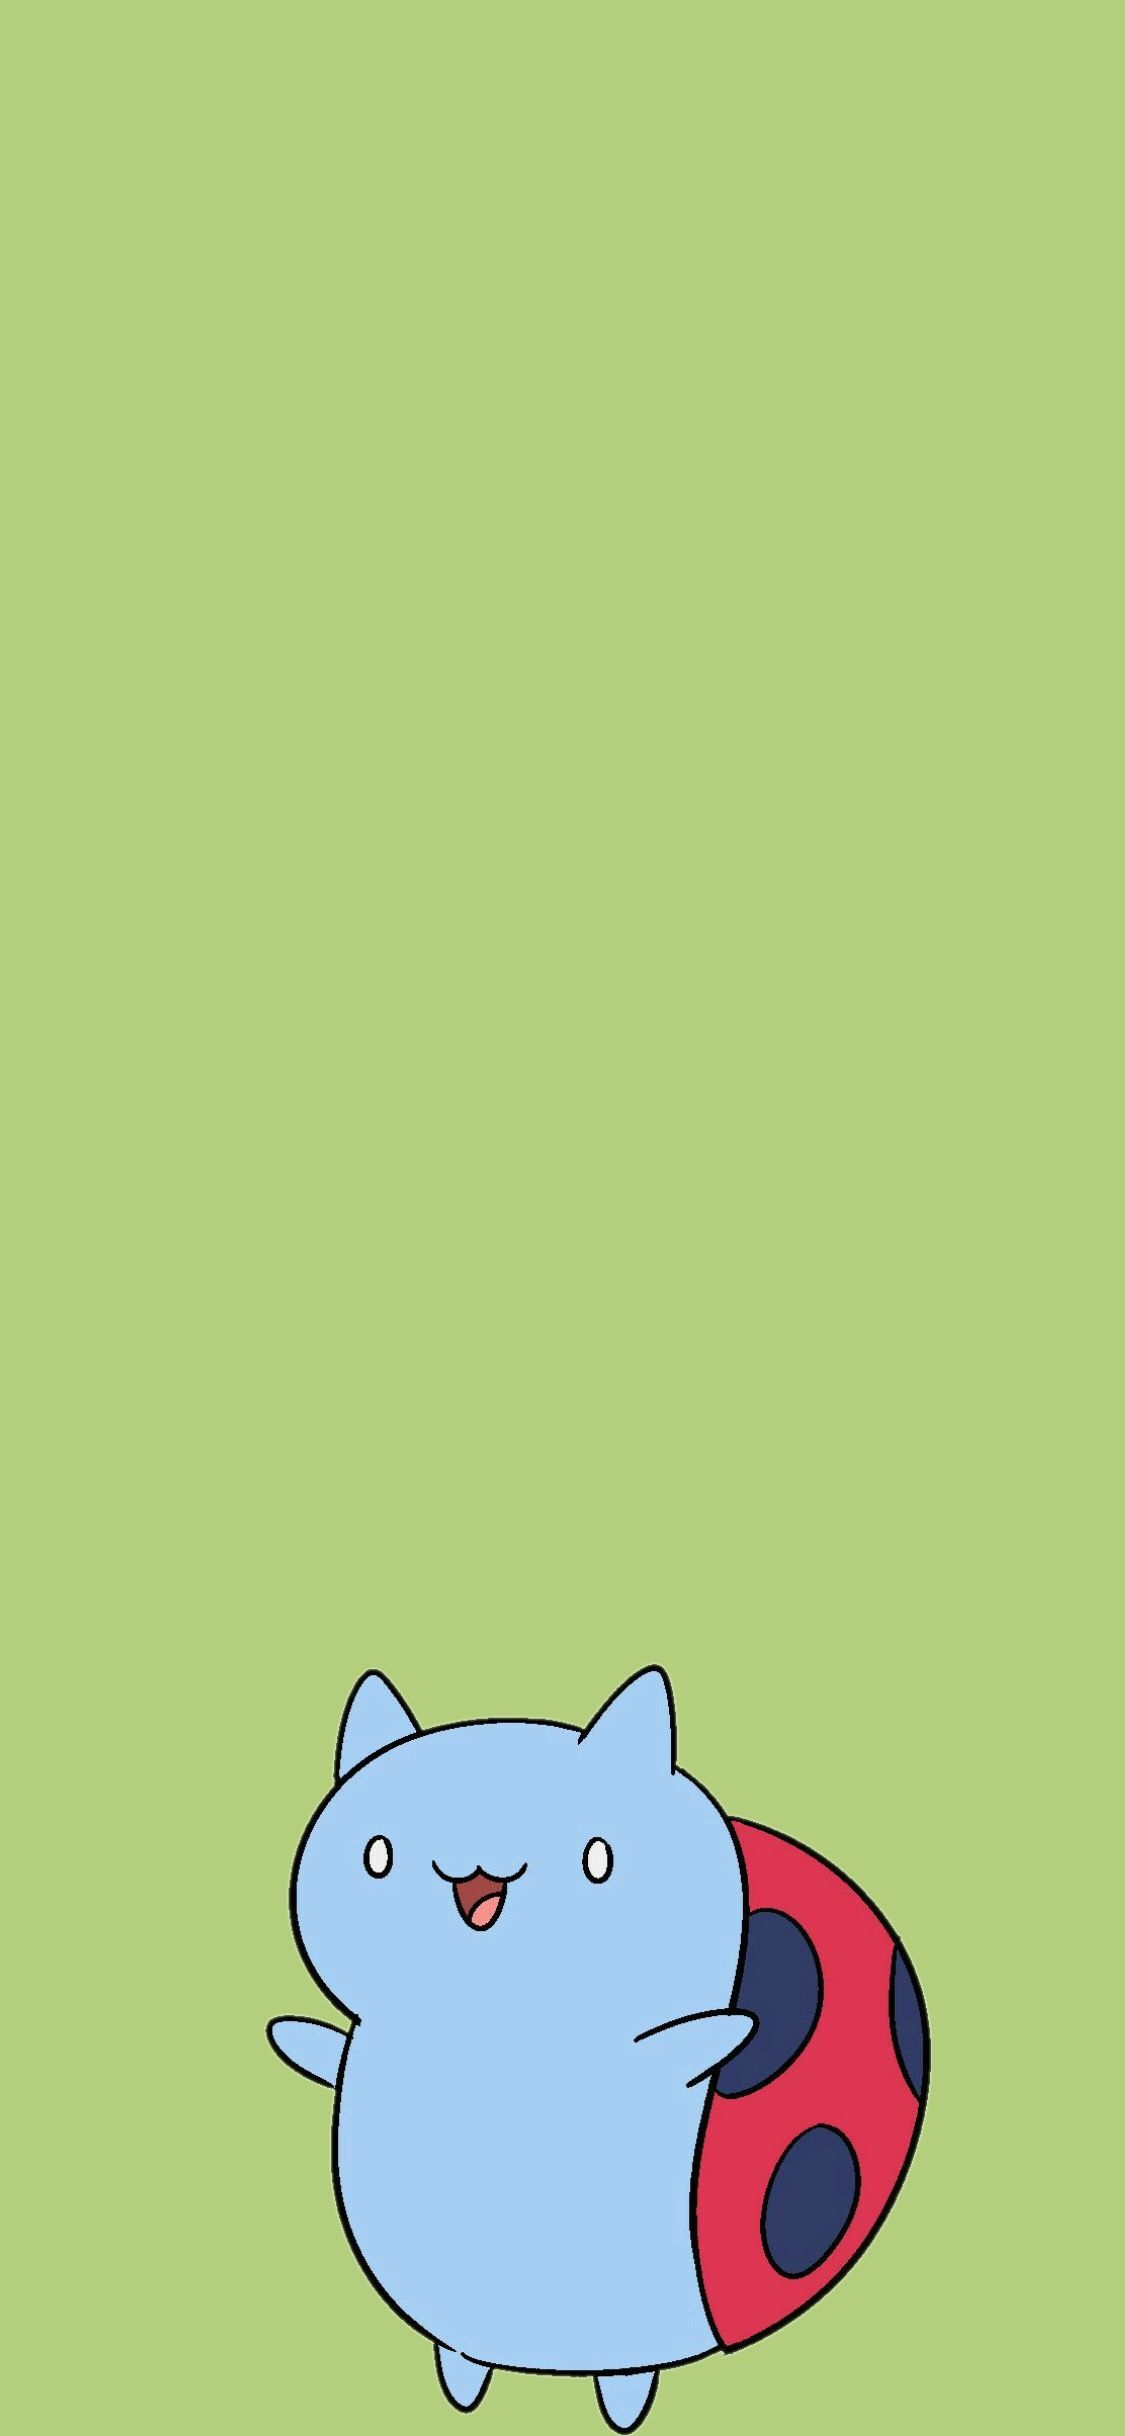 Catbug Wallpaper Creds Livunique14 Cute Cartoon Wallpapers